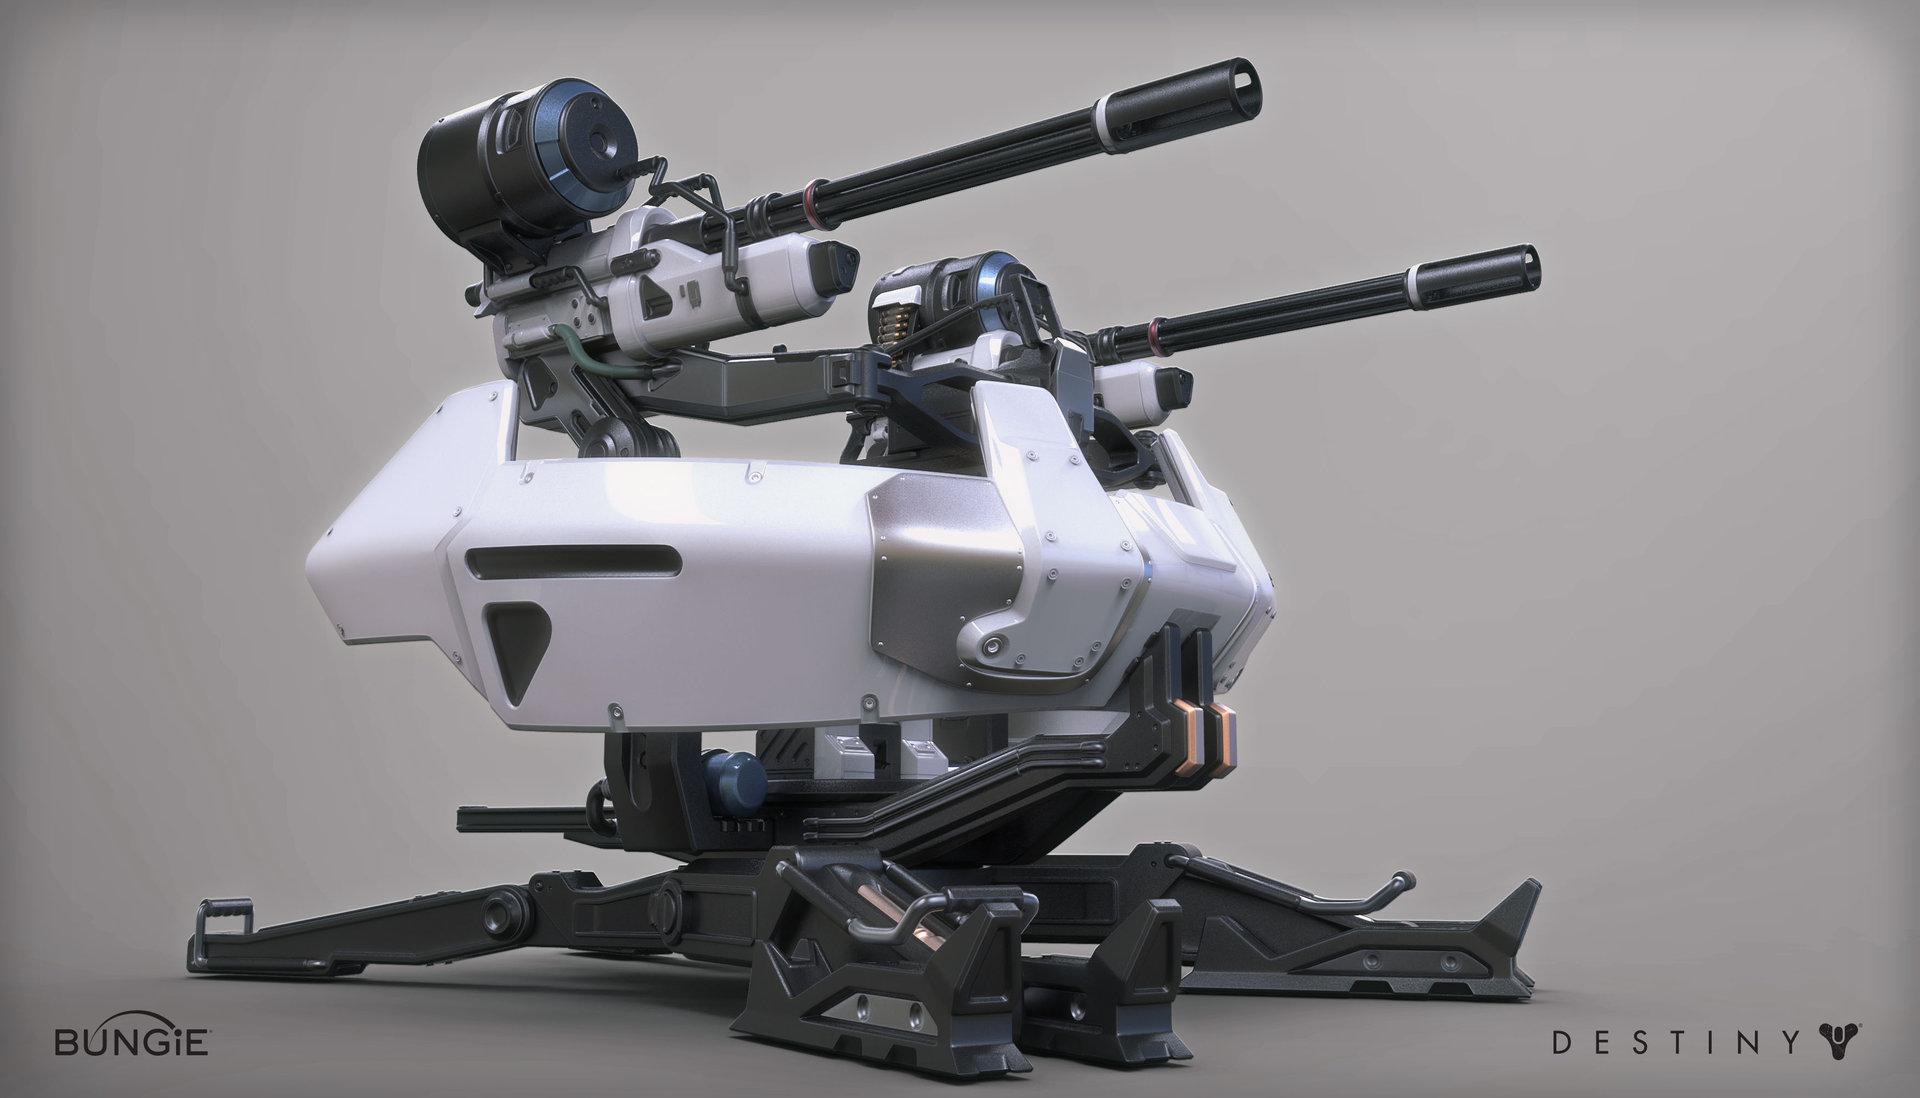 Mark van haitsma fotc turret front perspective